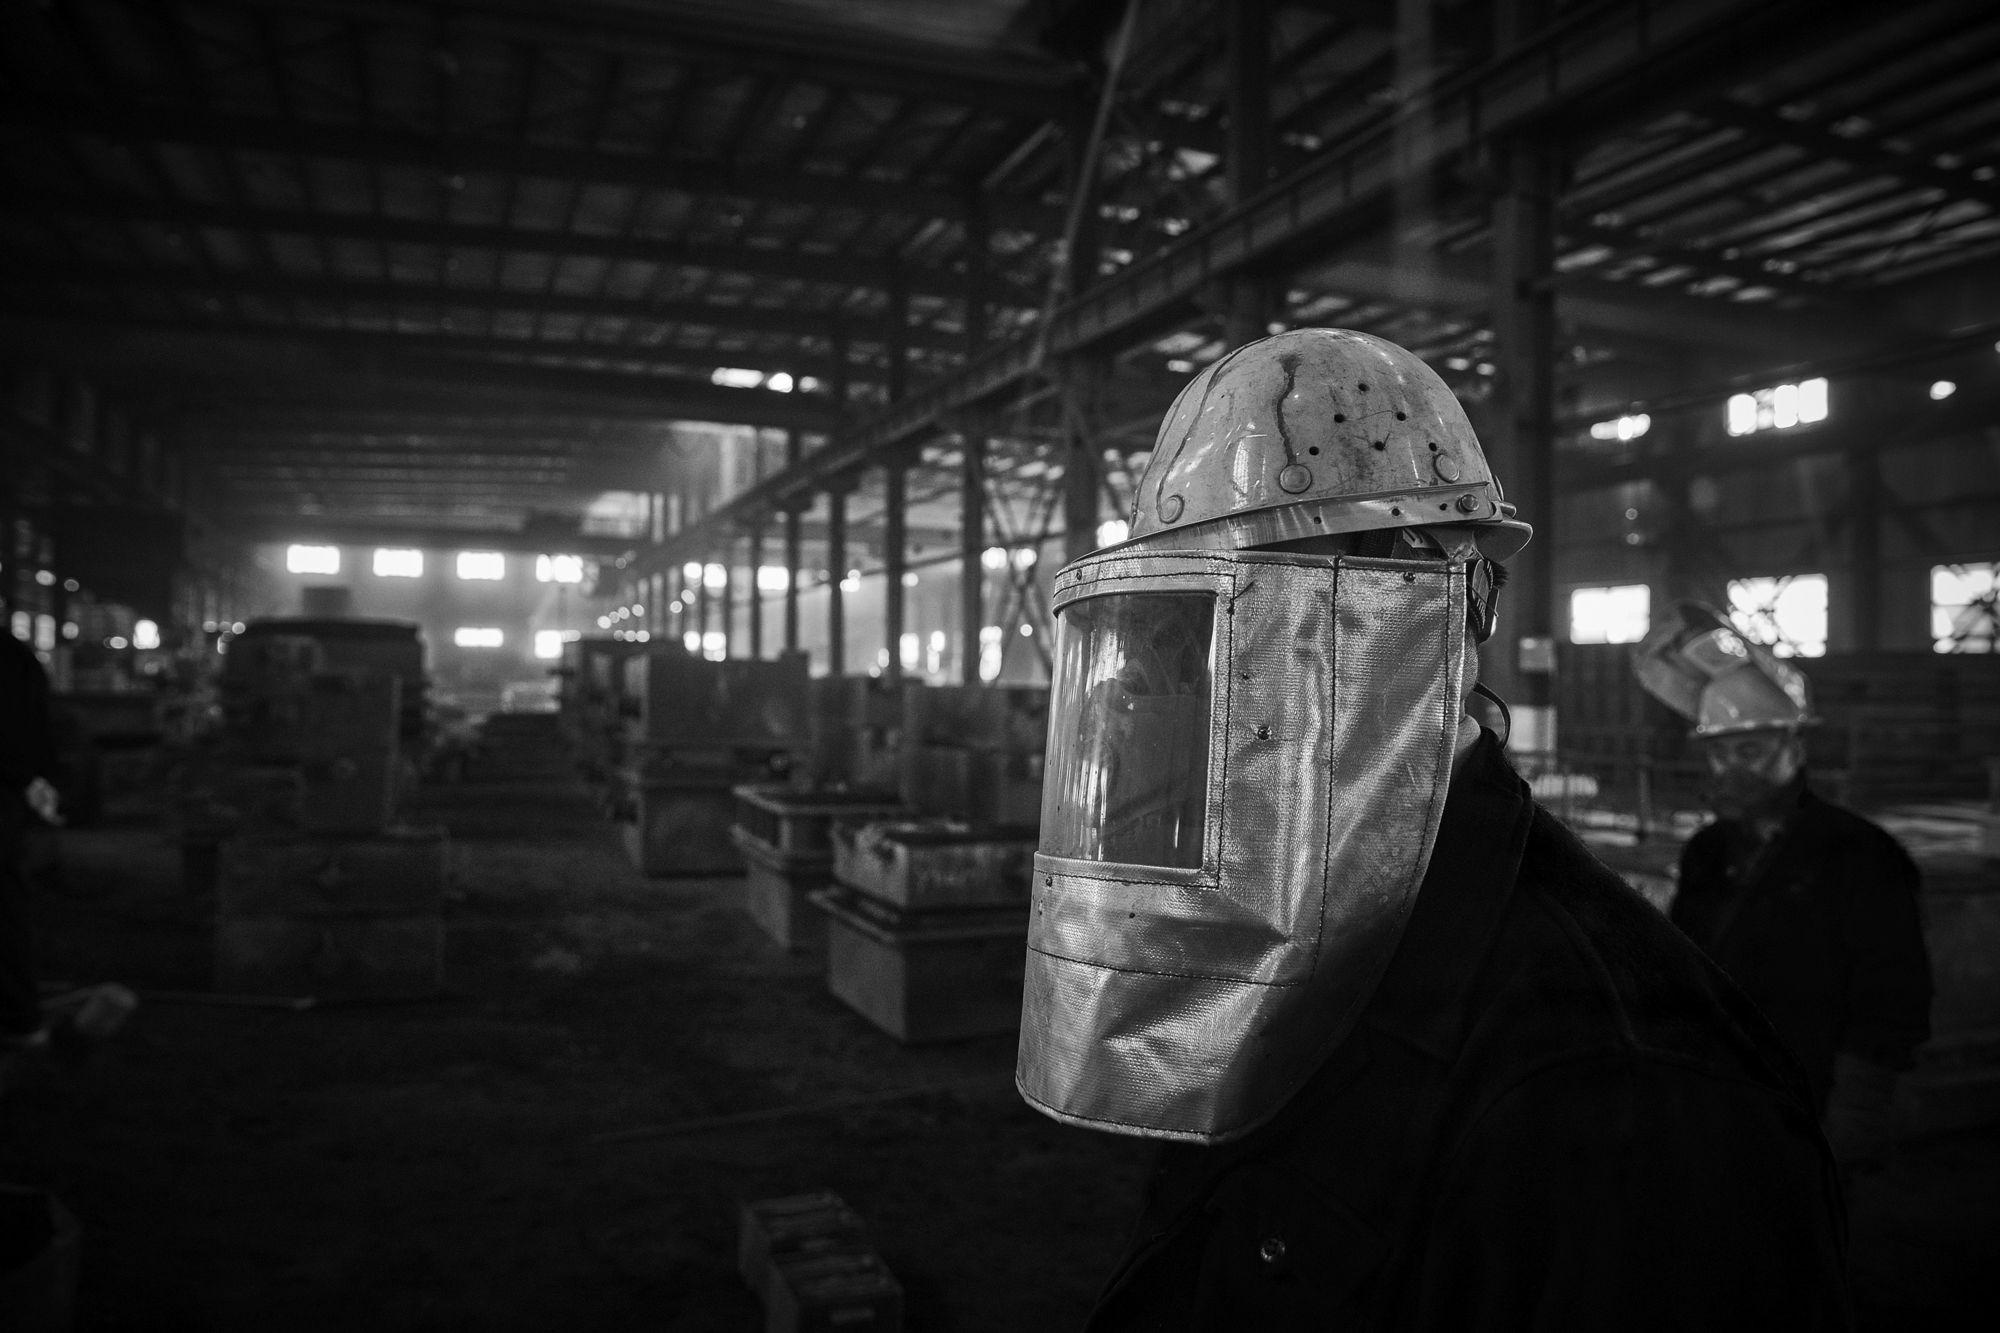 SCANDERBEG SAUER : Shenyang Yuanda Compressor Foundry (China) for Burckhardt Compression